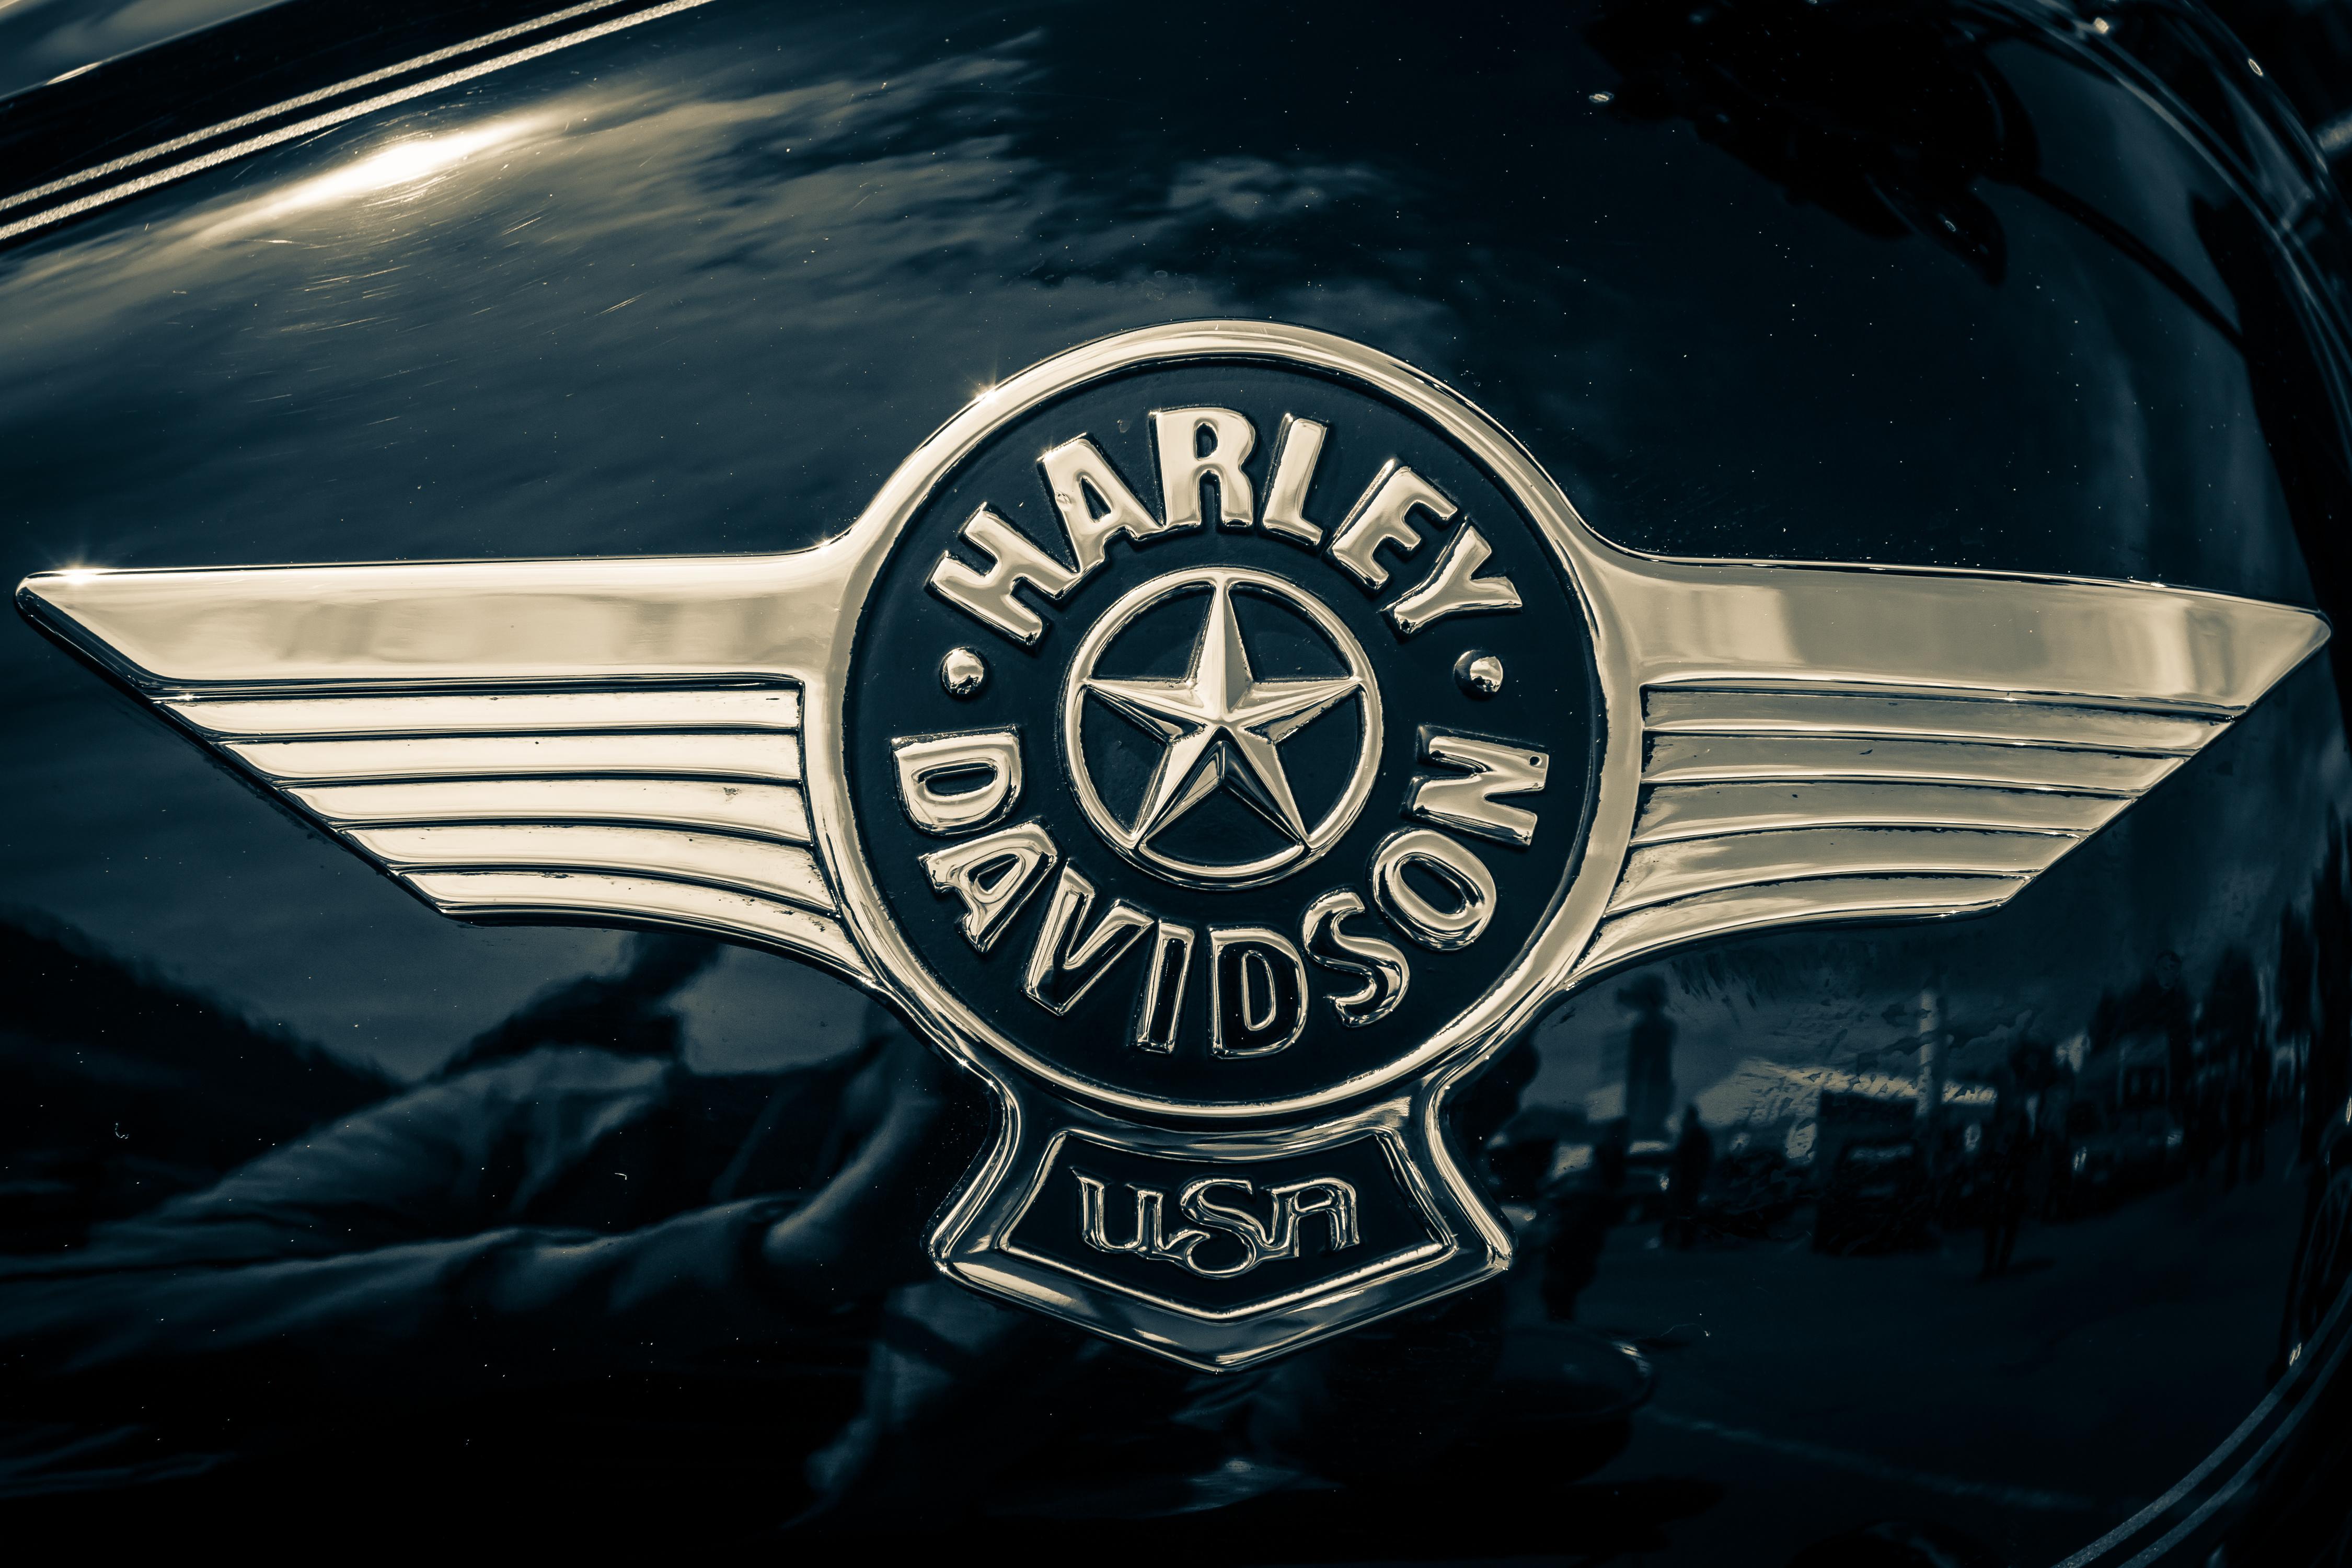 Harley Davidson Tarihi